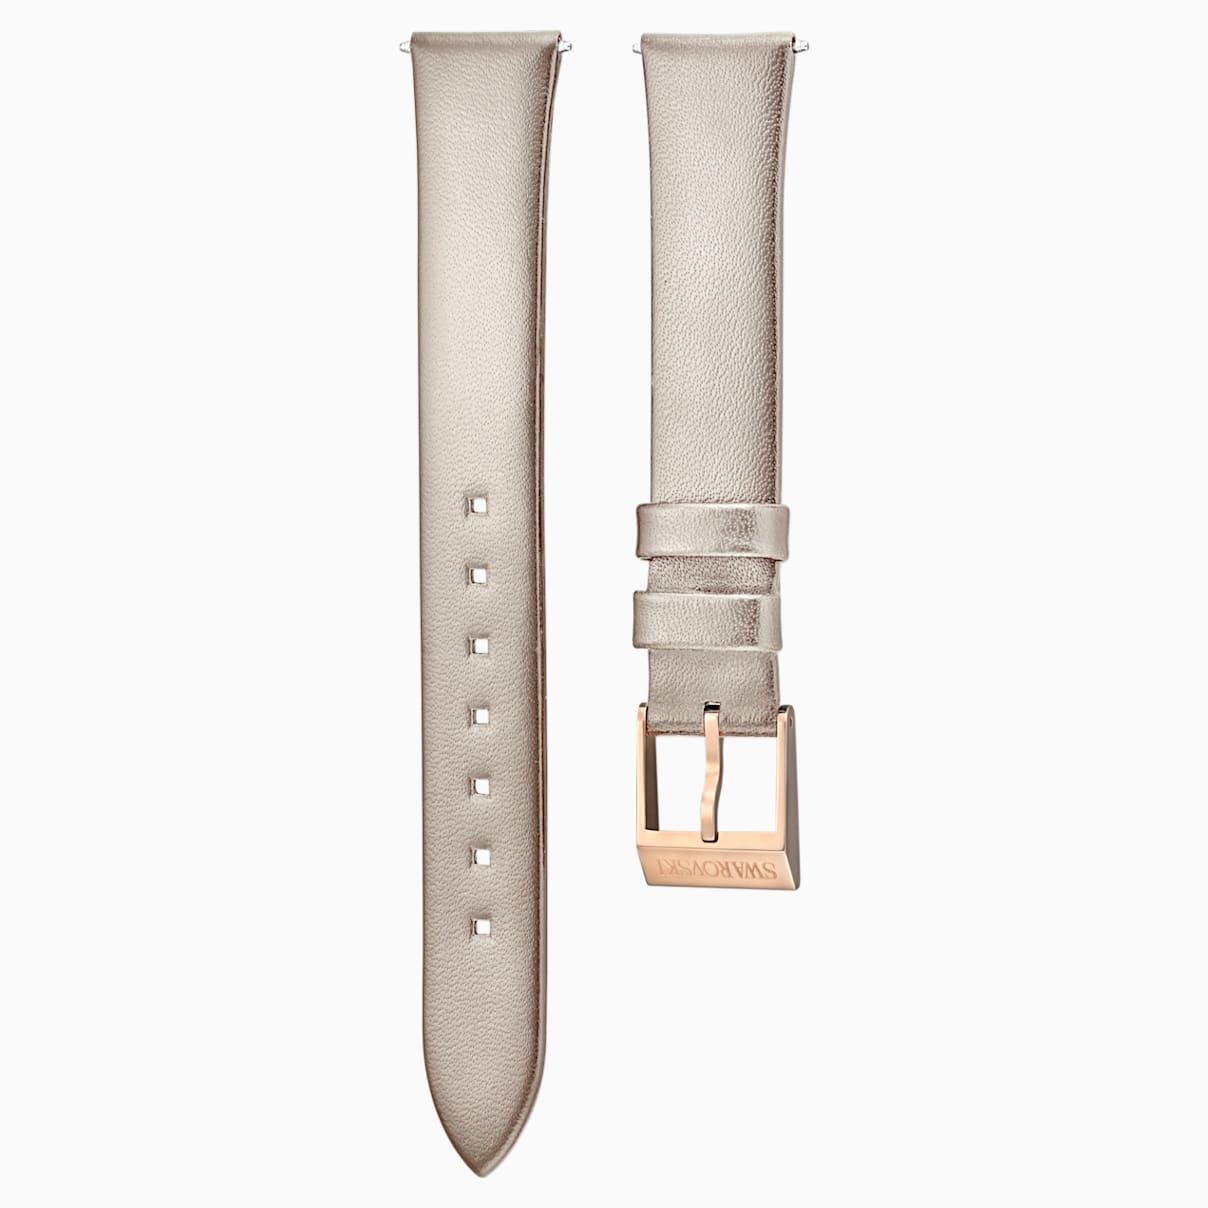 Swarovski 12mm Watch strap, Leather, Light gray, Rose-gold tone plated